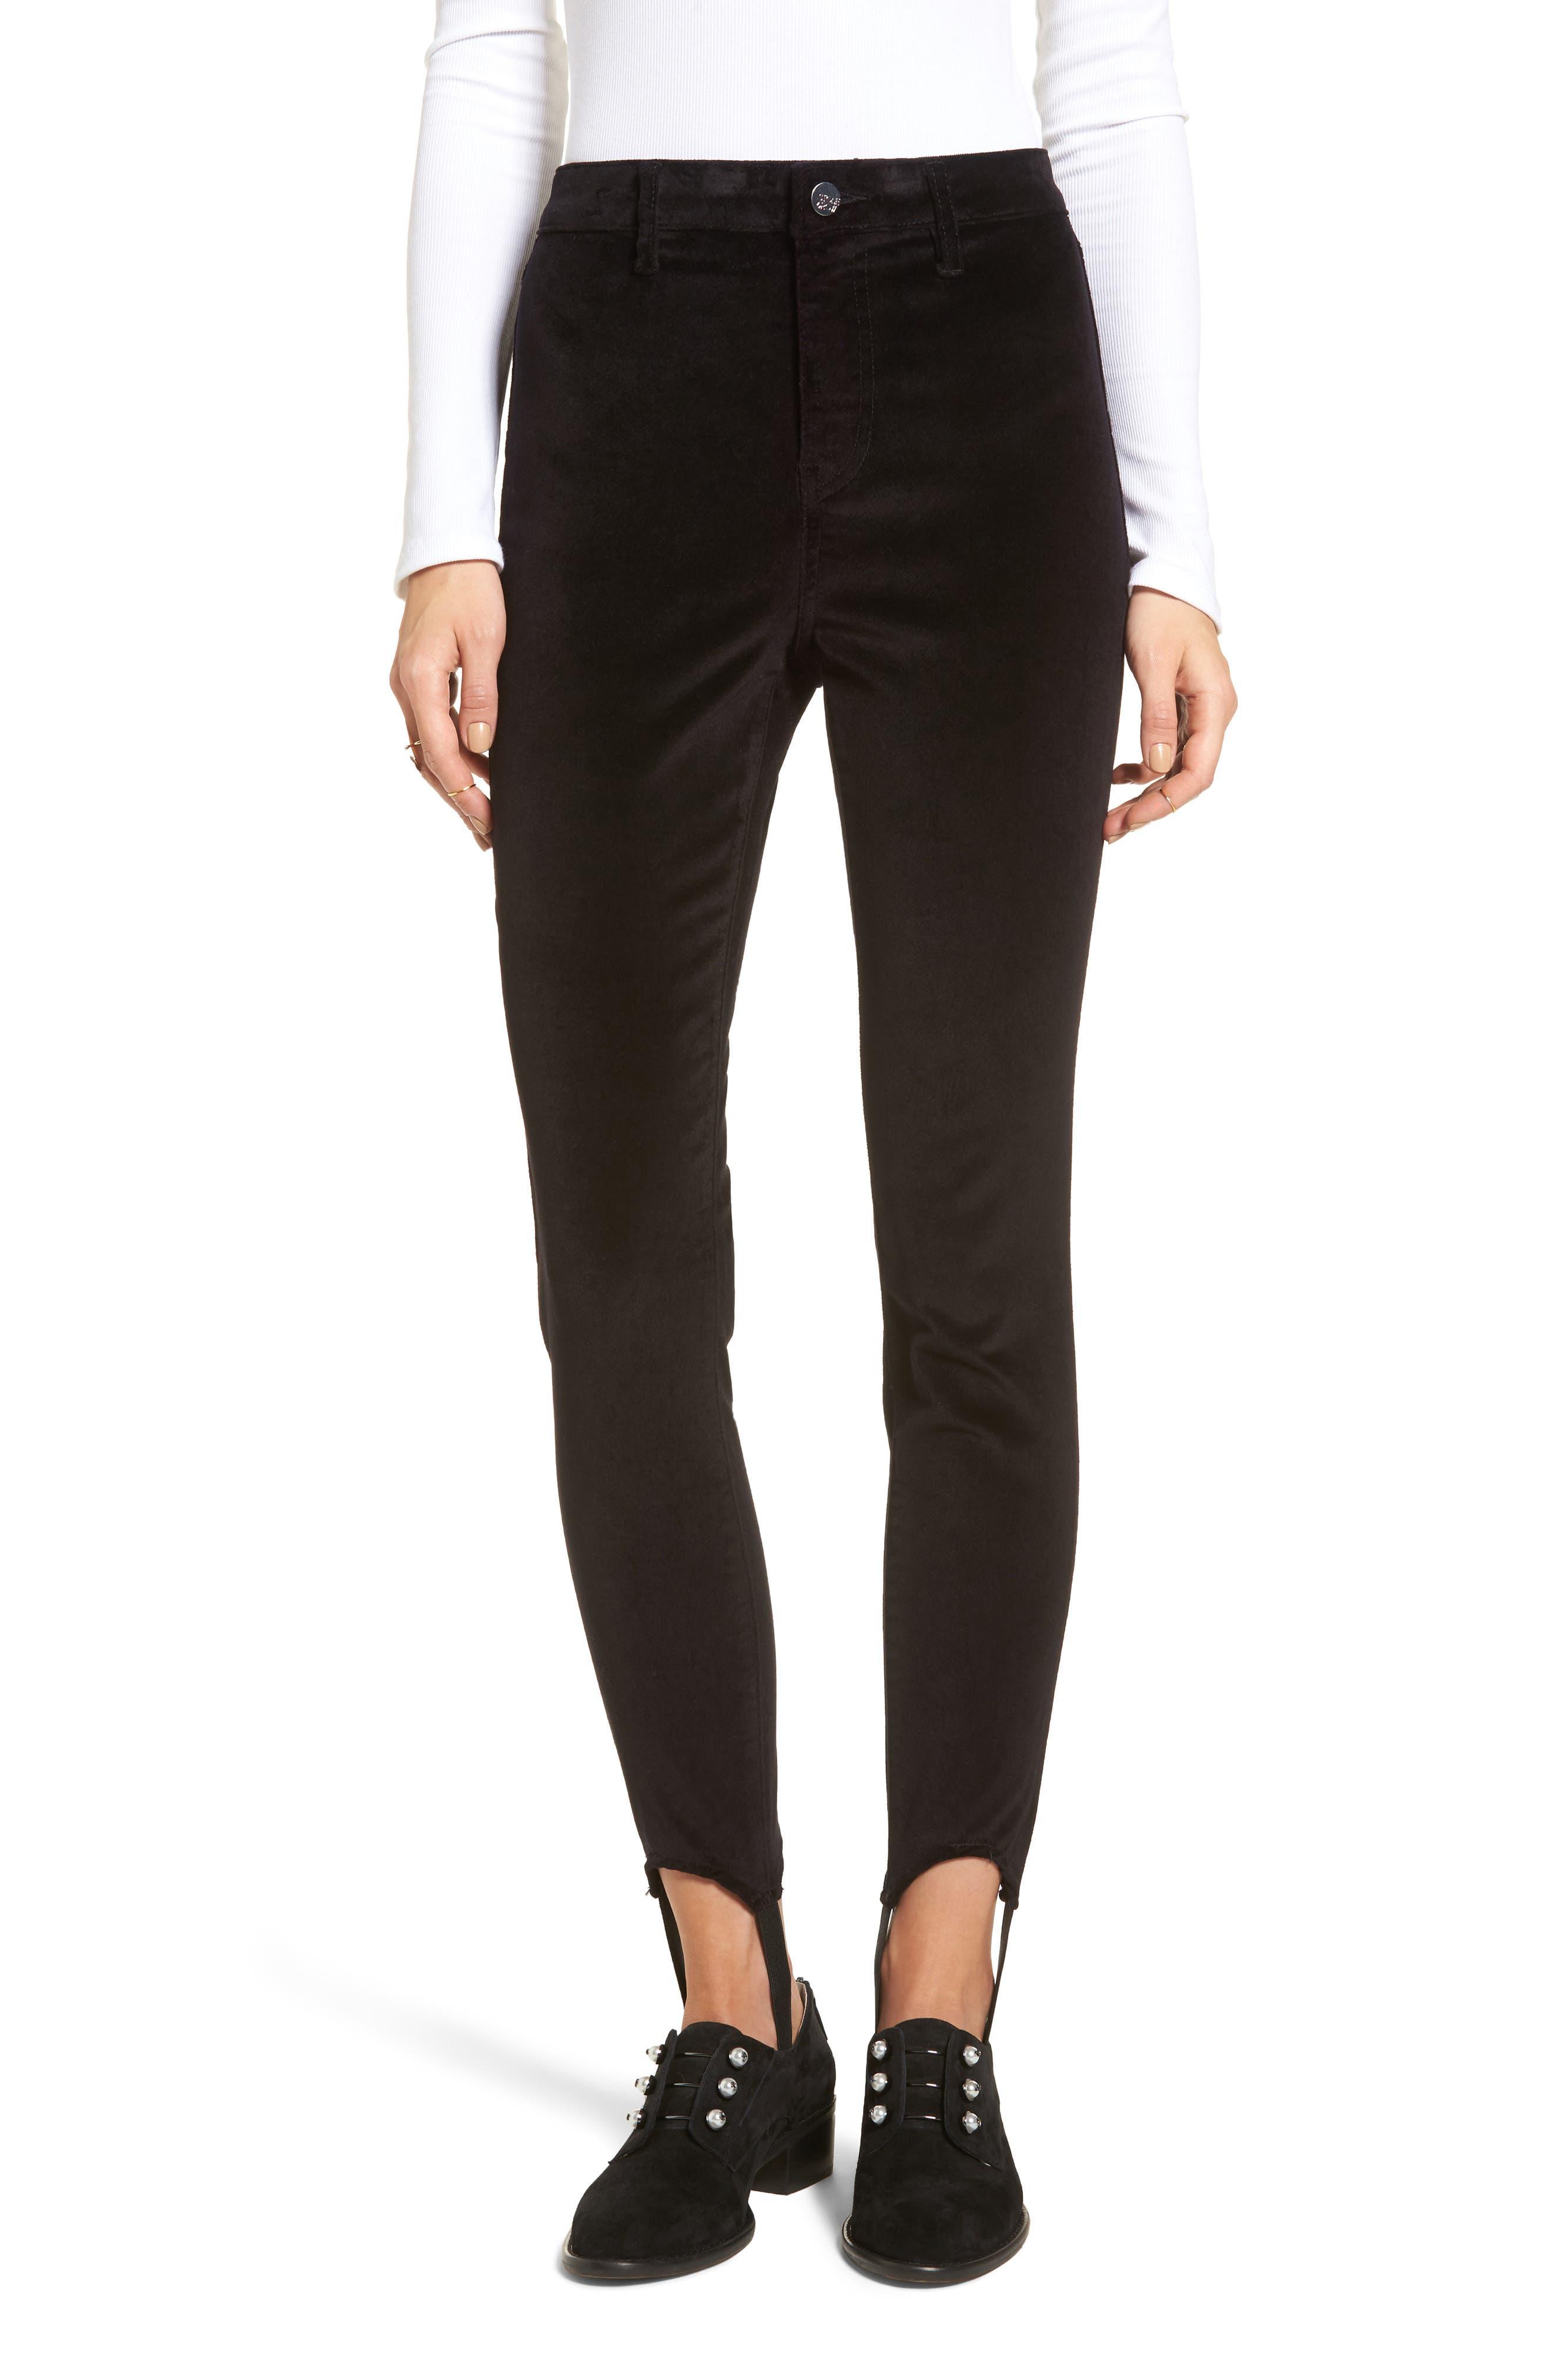 Stir It Up Velvet Stirrup Leggings,                         Main,                         color, Black